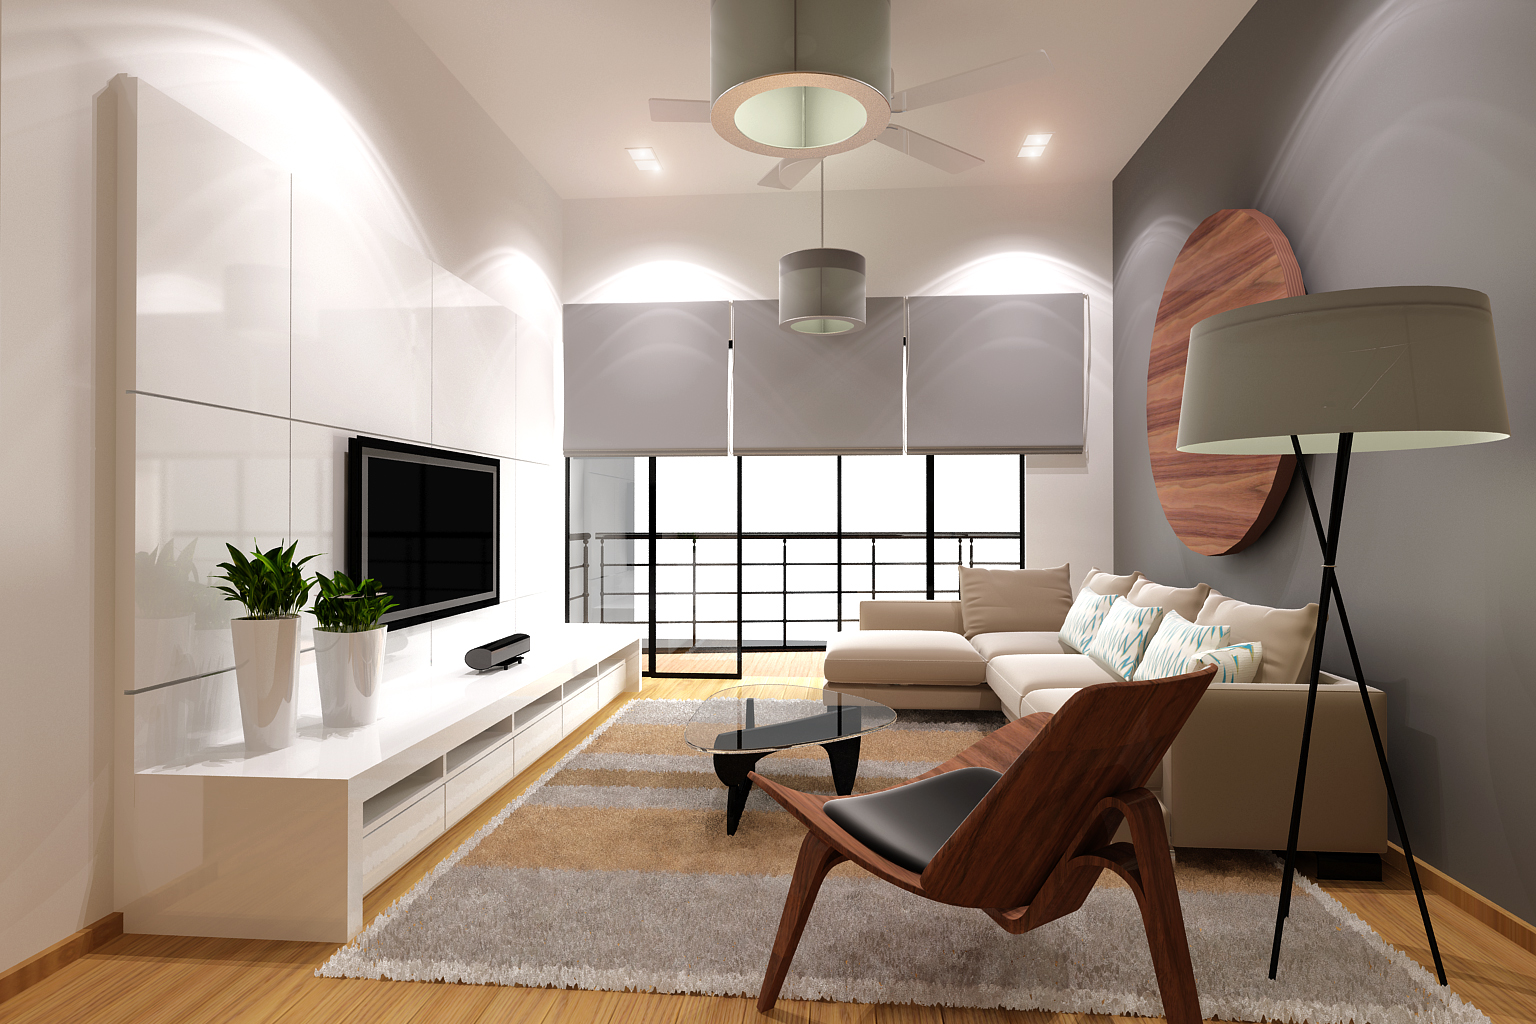 Zen-room | Interior Design Center Inspiration